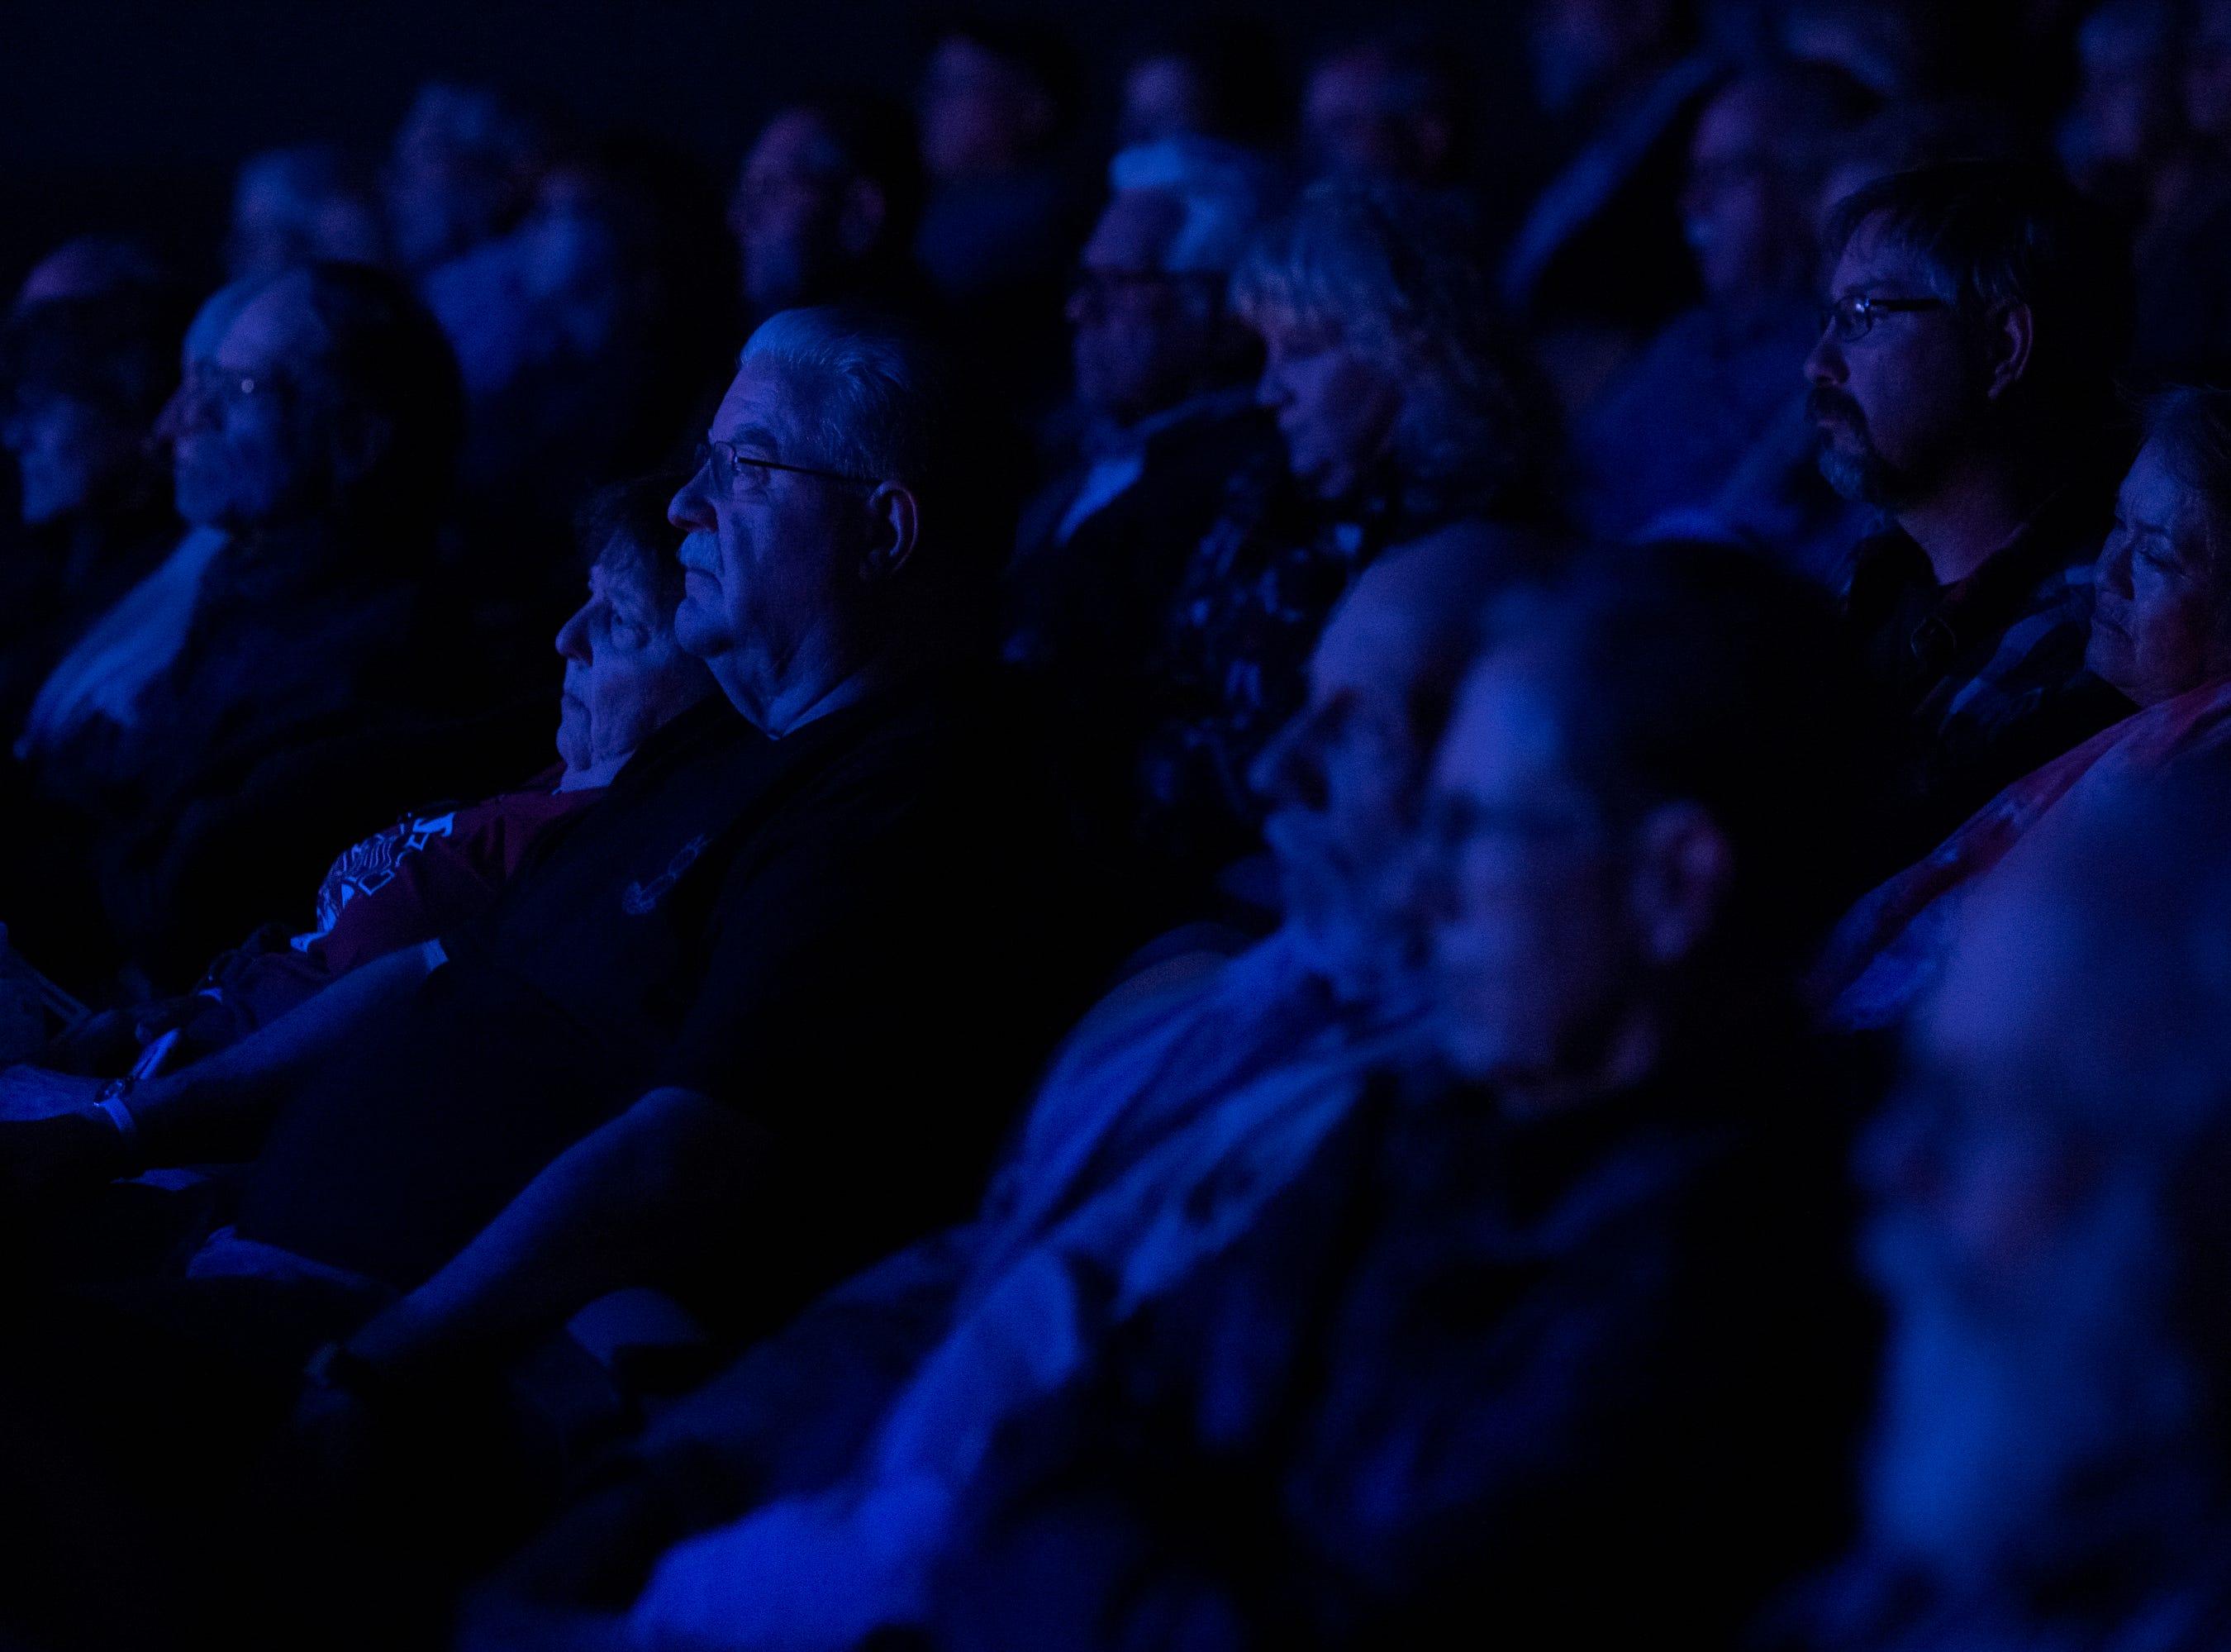 Rio Grande Theatre attendees watch a reenactment of the Jesse Wayne Brazel trial on Saturday, Feb. 2, 2019.